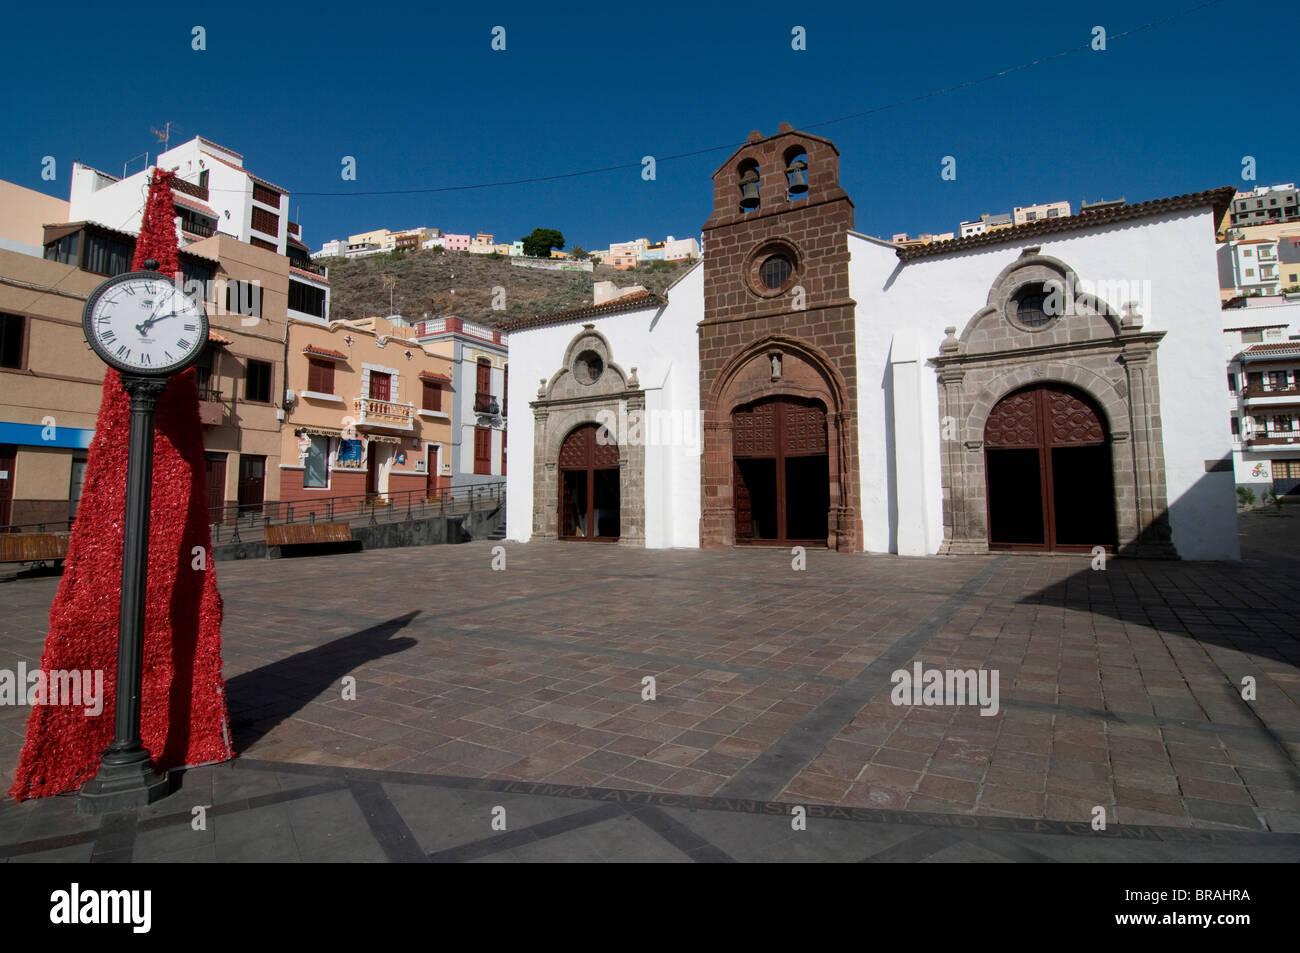 Iglesia de la Virgen de Asuncion, San Sebastian de la Gomera, La Gomera, Canary Islands, Spain, Europe - Stock Image